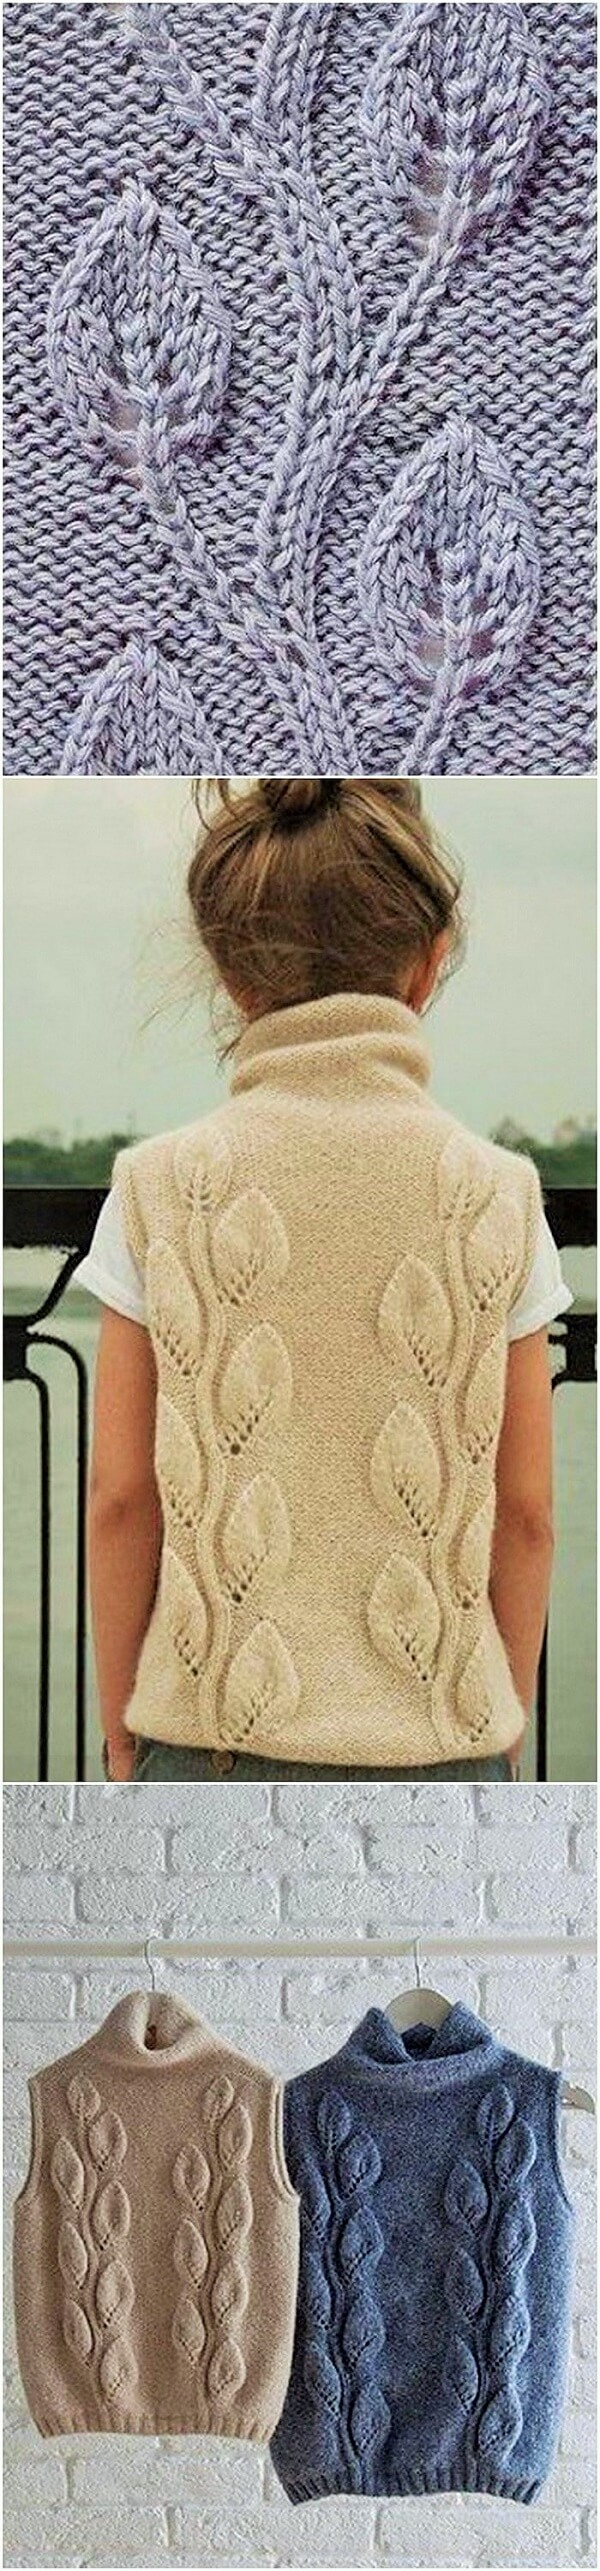 homemade with crochet Ladies Fashion Ideas -3